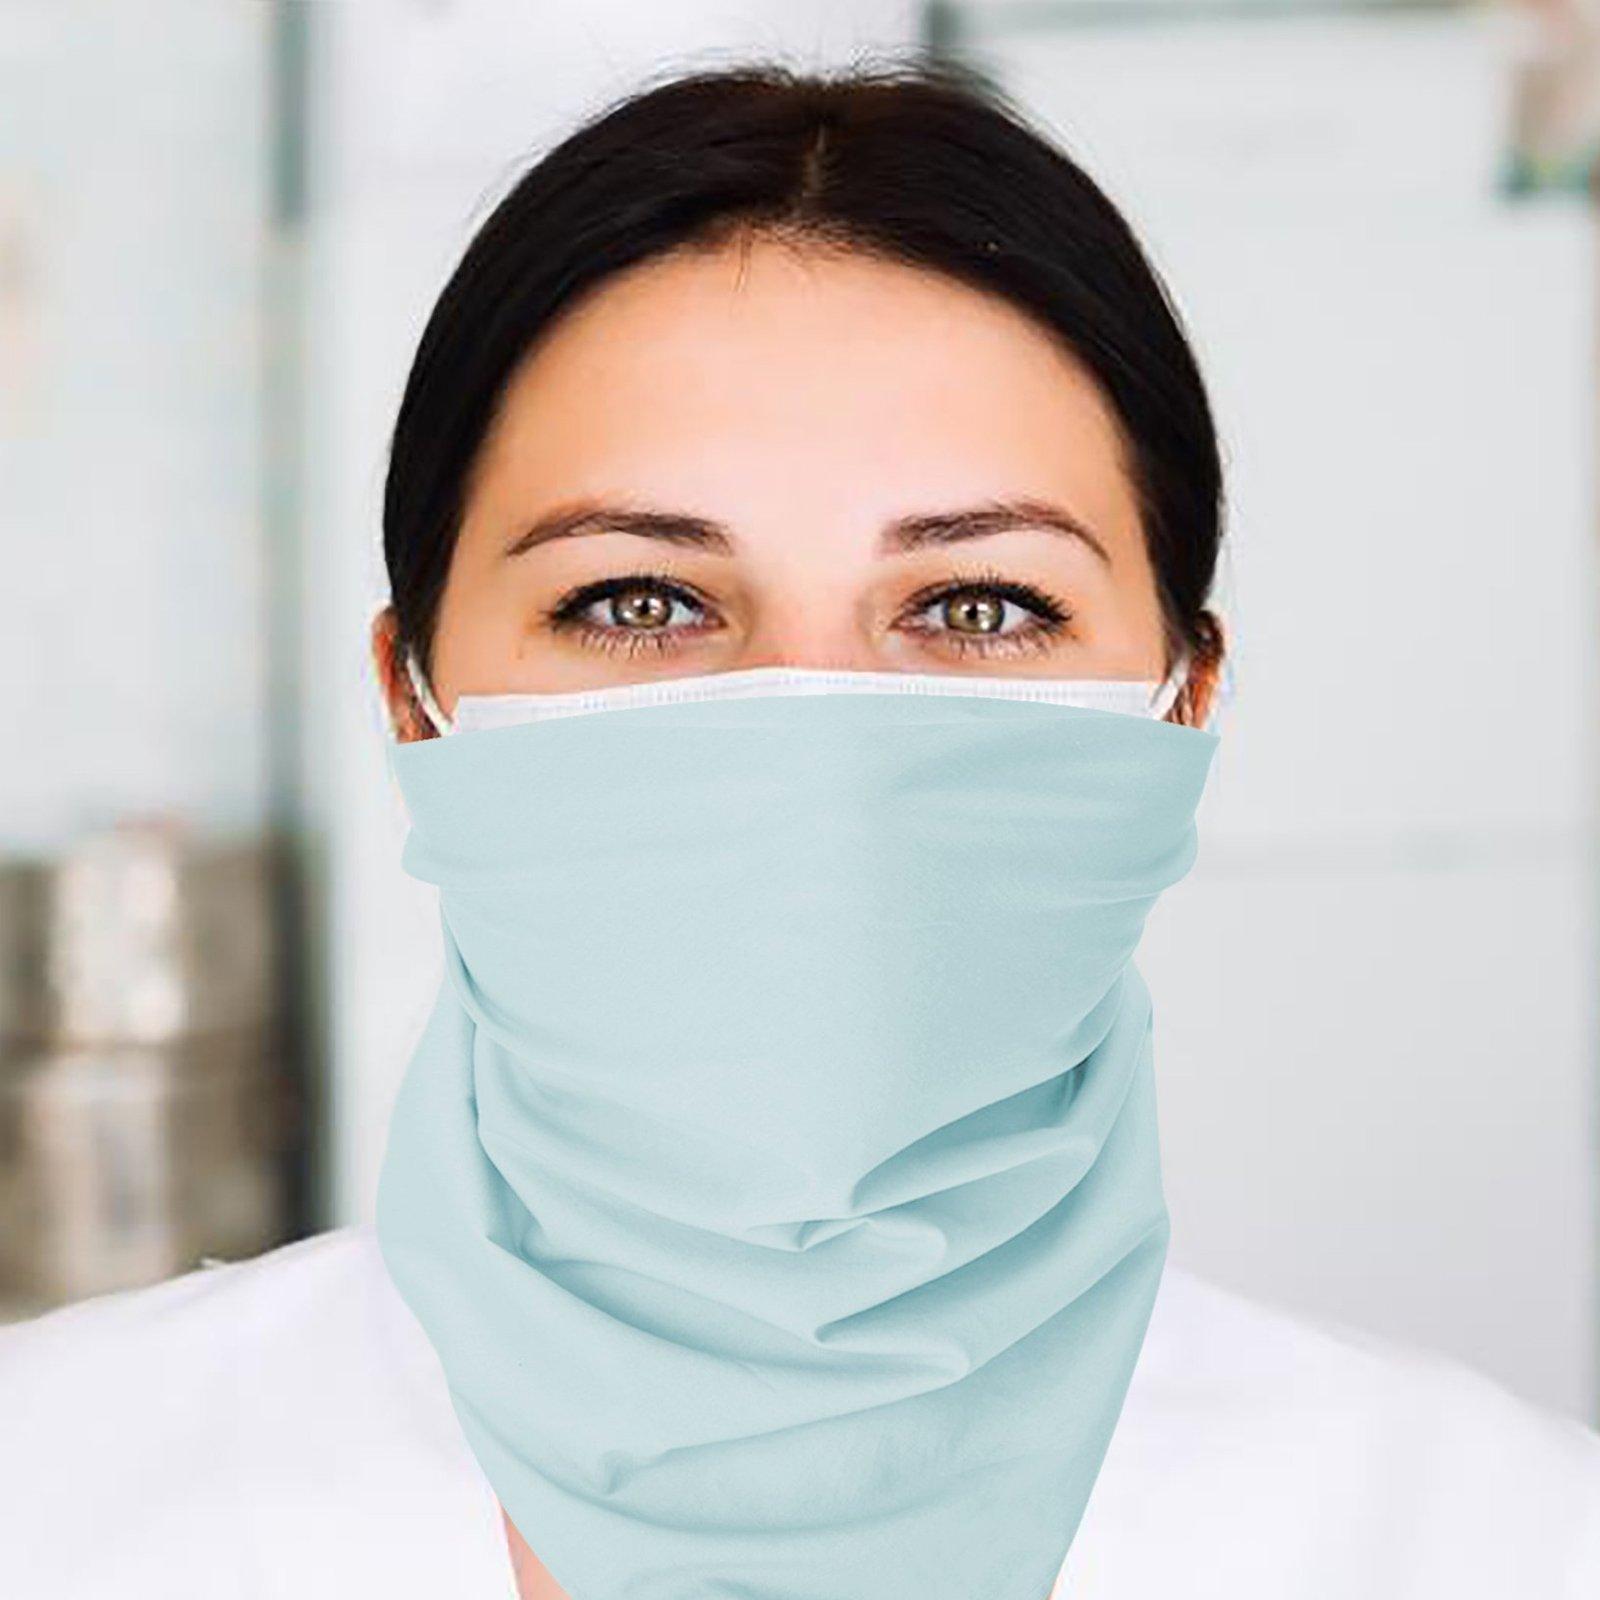 A nurse wearing a flat bandana around her face